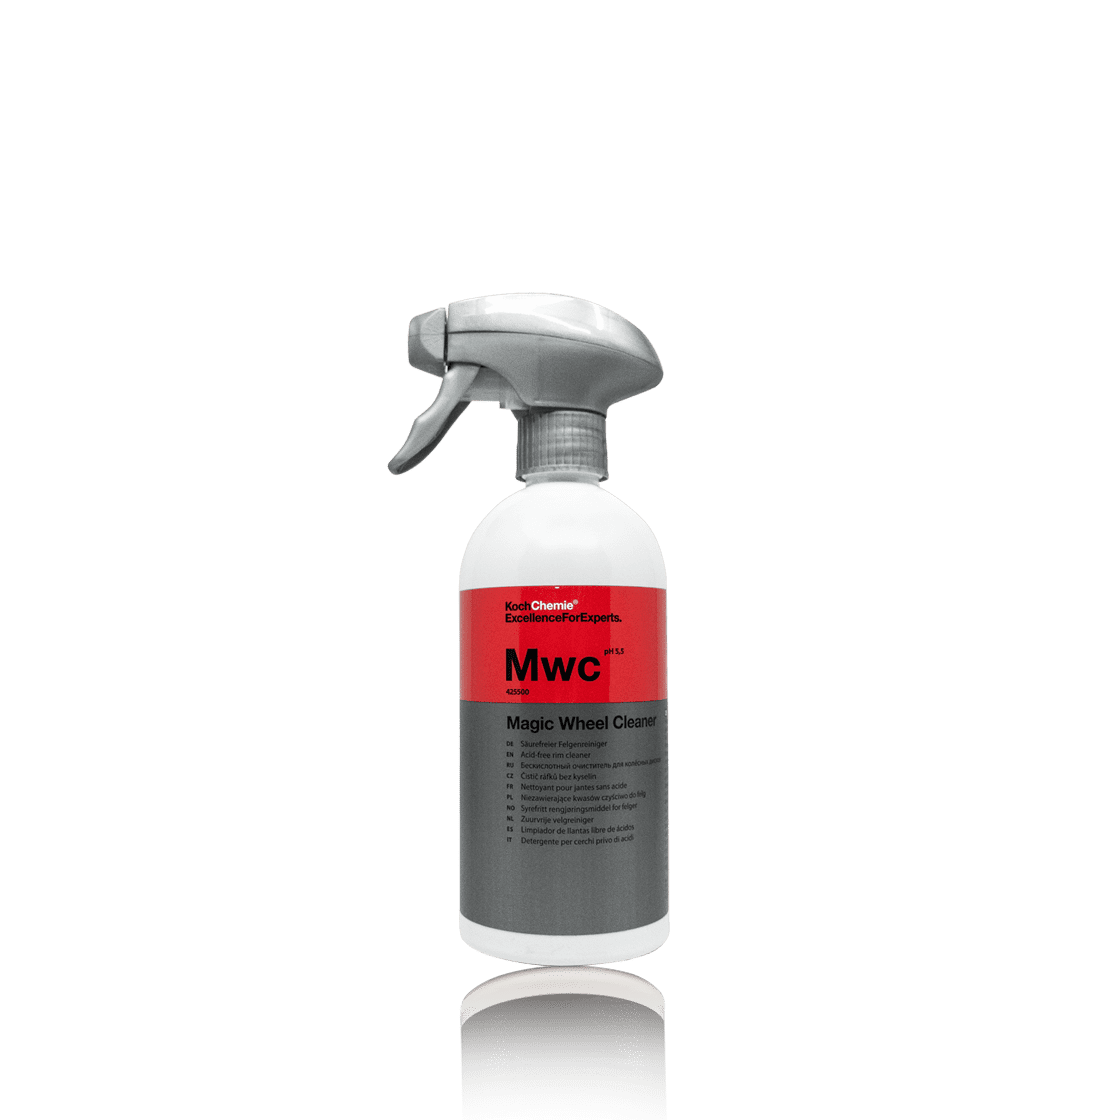 KochChemie_Mwc-Magic-Wheel-Cleaner